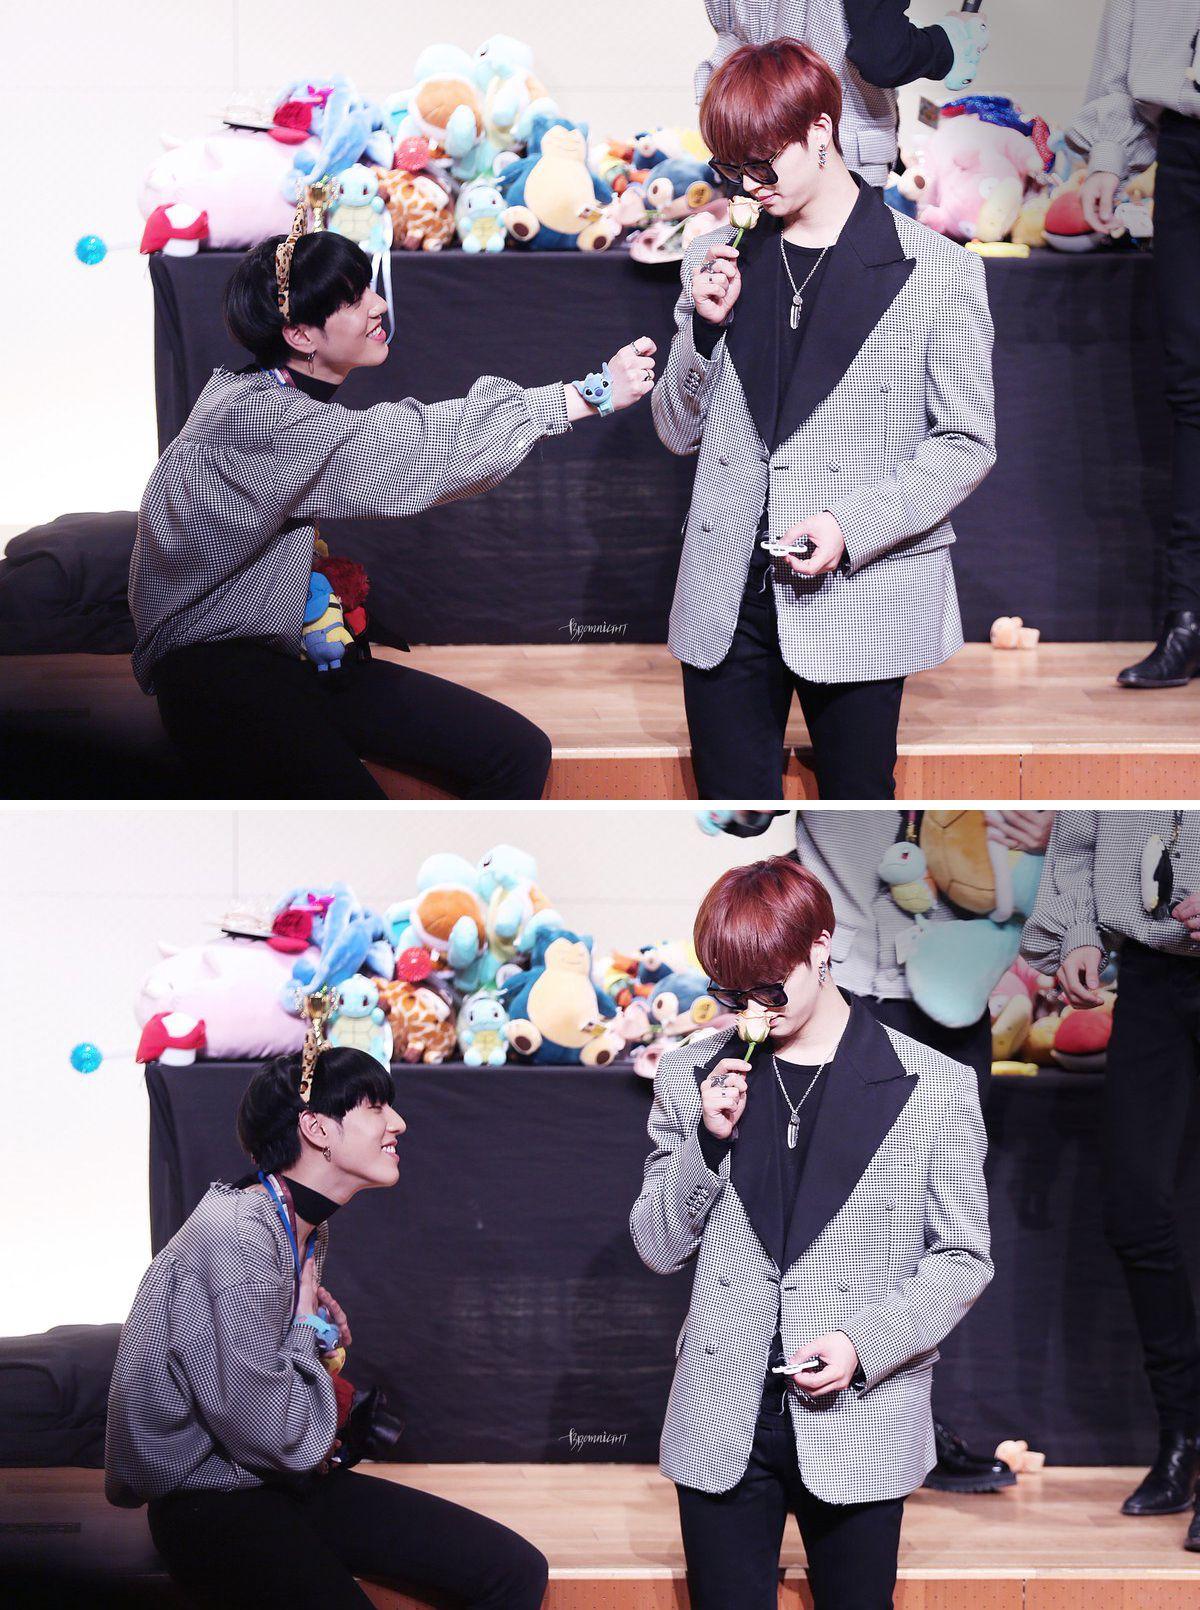 #YuGyeom #유겸 #GOT7 #JB #갓세븐 #k-pop #JYP